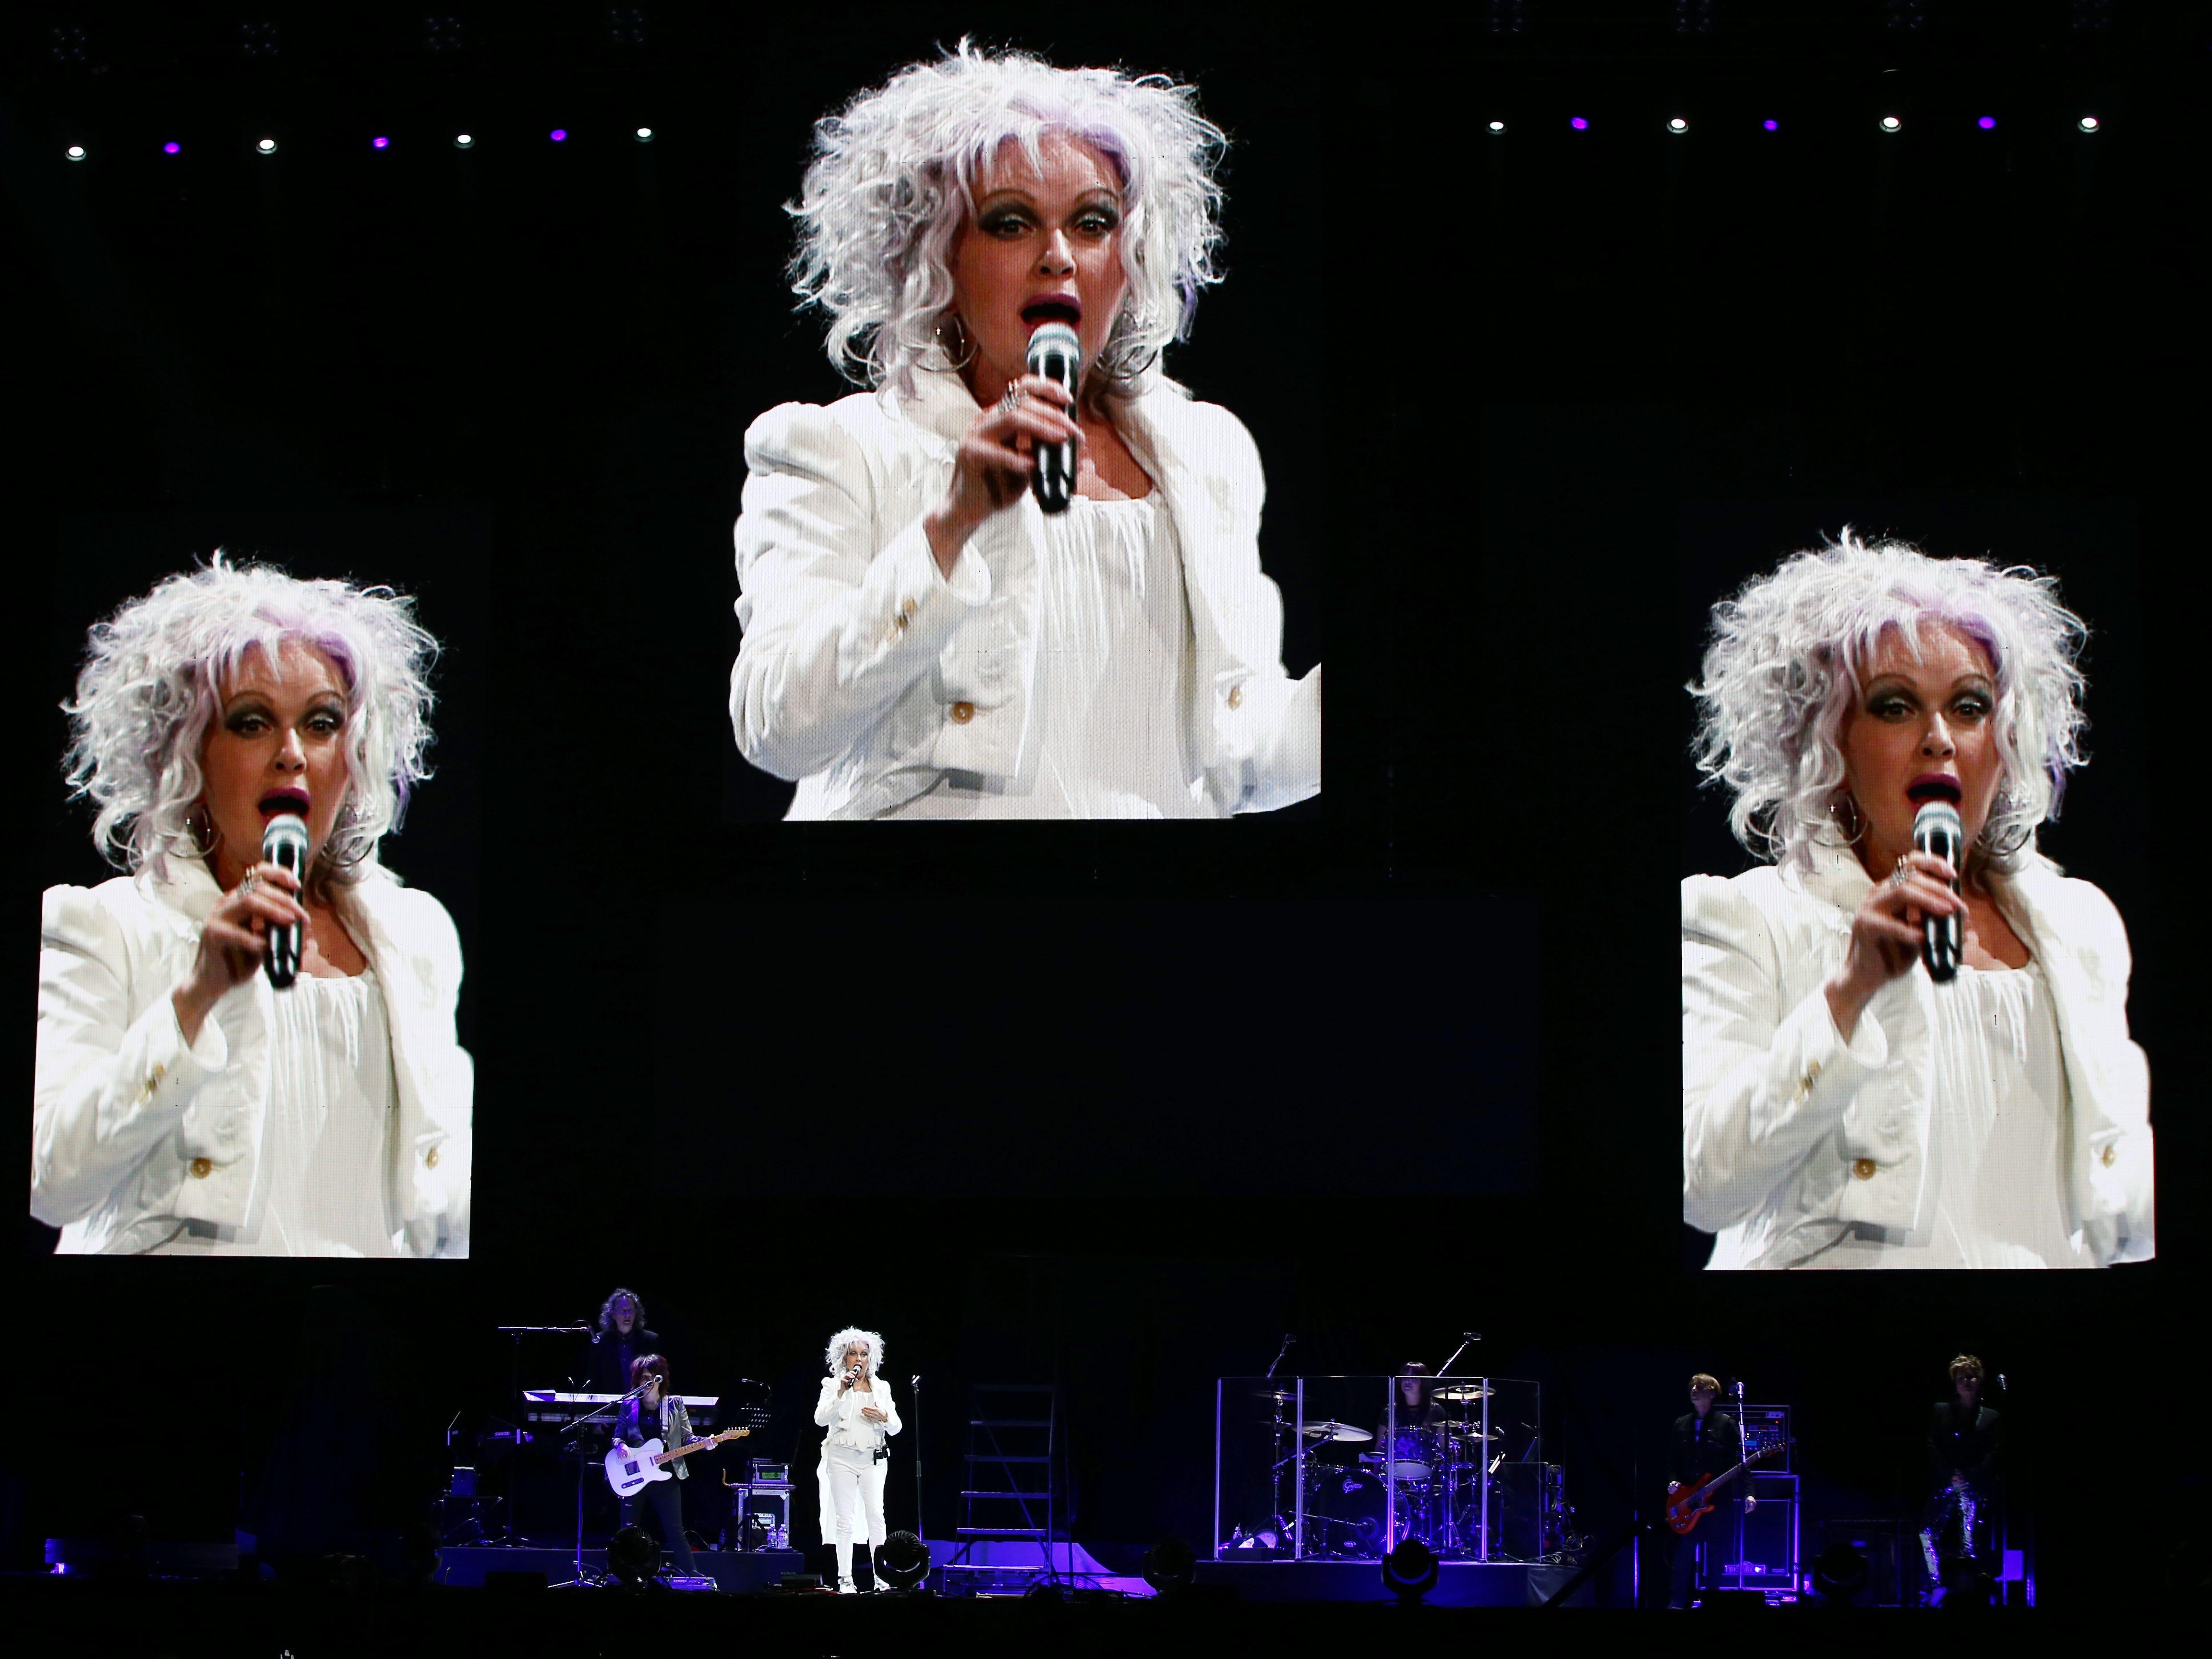 Cyndi Lauper performs on Aug. 24, 2018, at Talking Stick Resort Arena in Phoenix, Ariz.